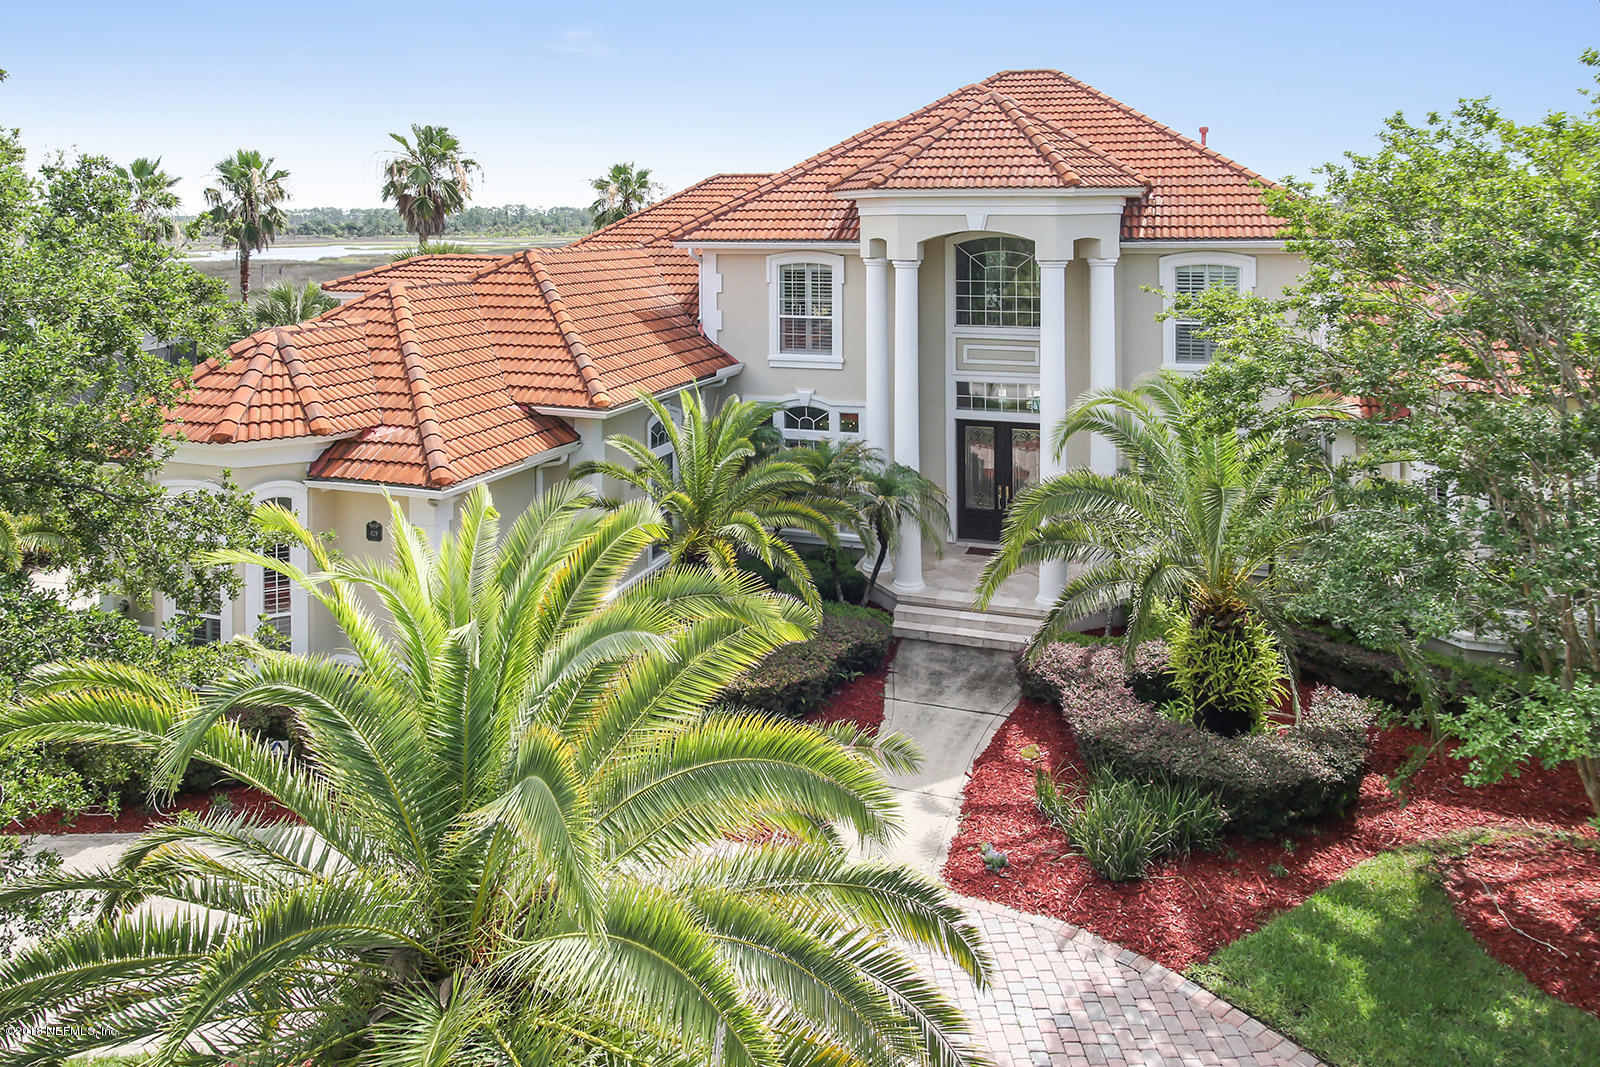 429 ROYAL TERN, JACKSONVILLE BEACH, FLORIDA 32250, 5 Bedrooms Bedrooms, ,6 BathroomsBathrooms,Residential - single family,For sale,ROYAL TERN,942028